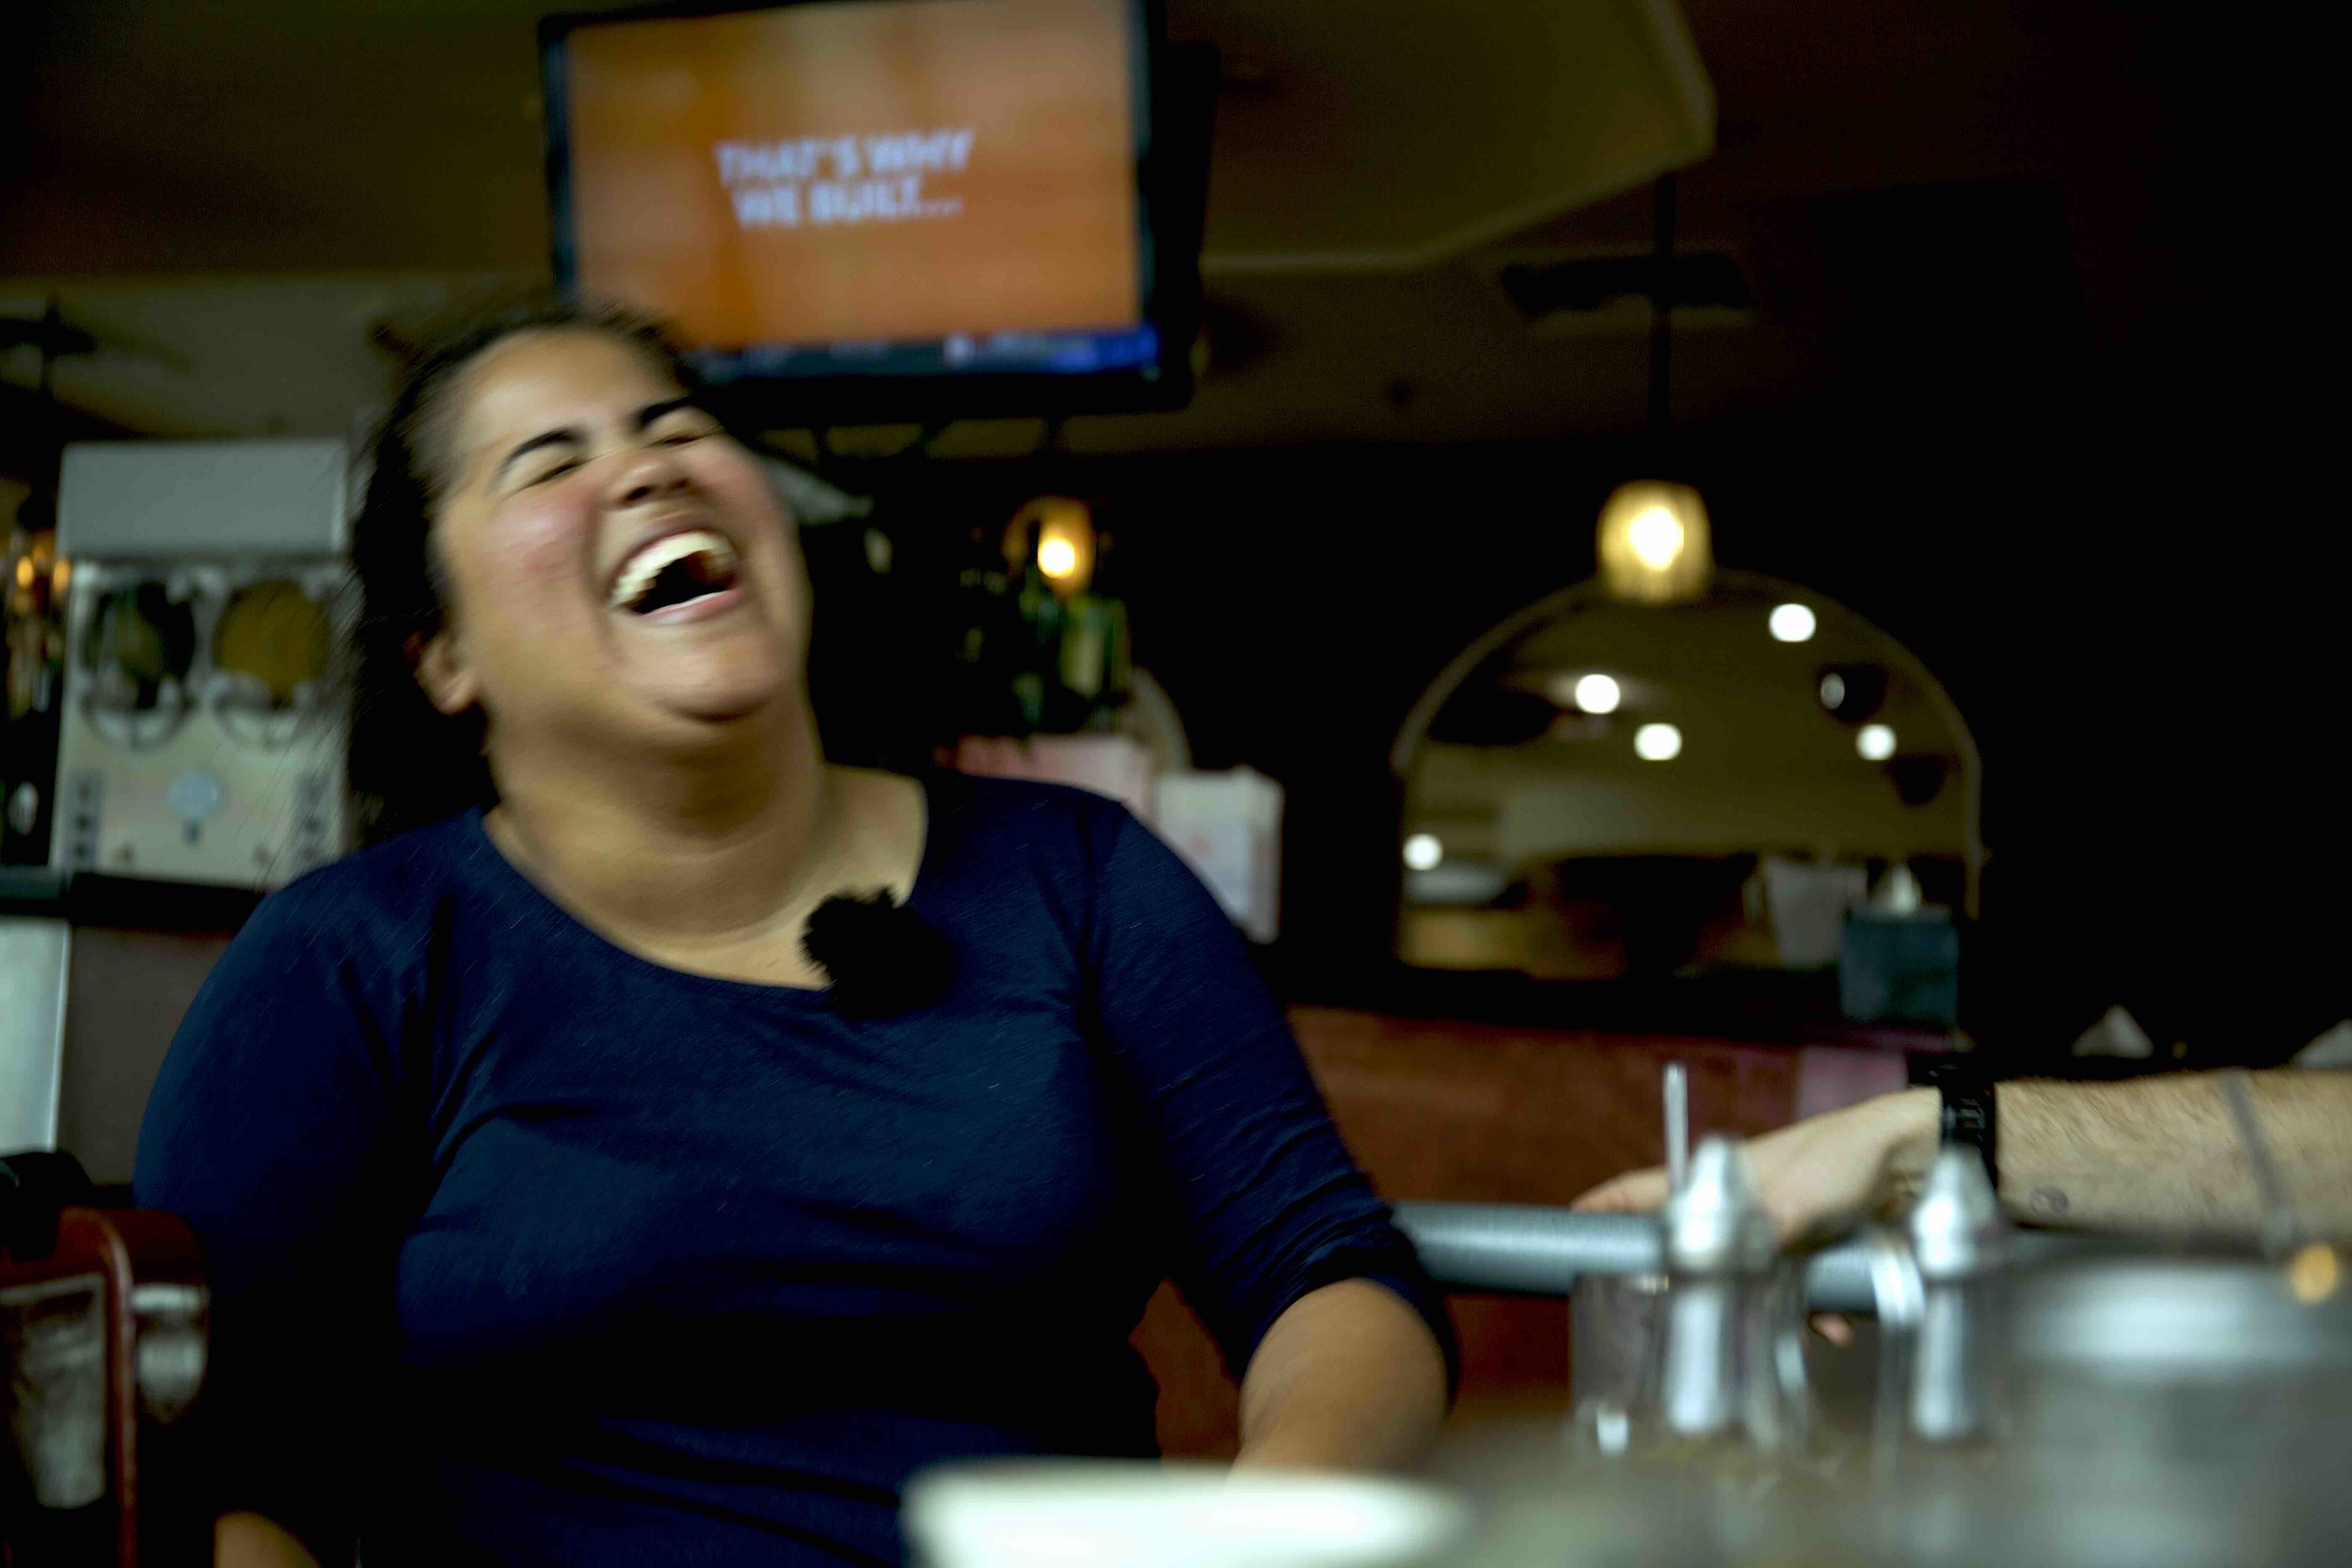 Ashlynn Salzano on The Roving Mic Podcast by Hayden Quinn